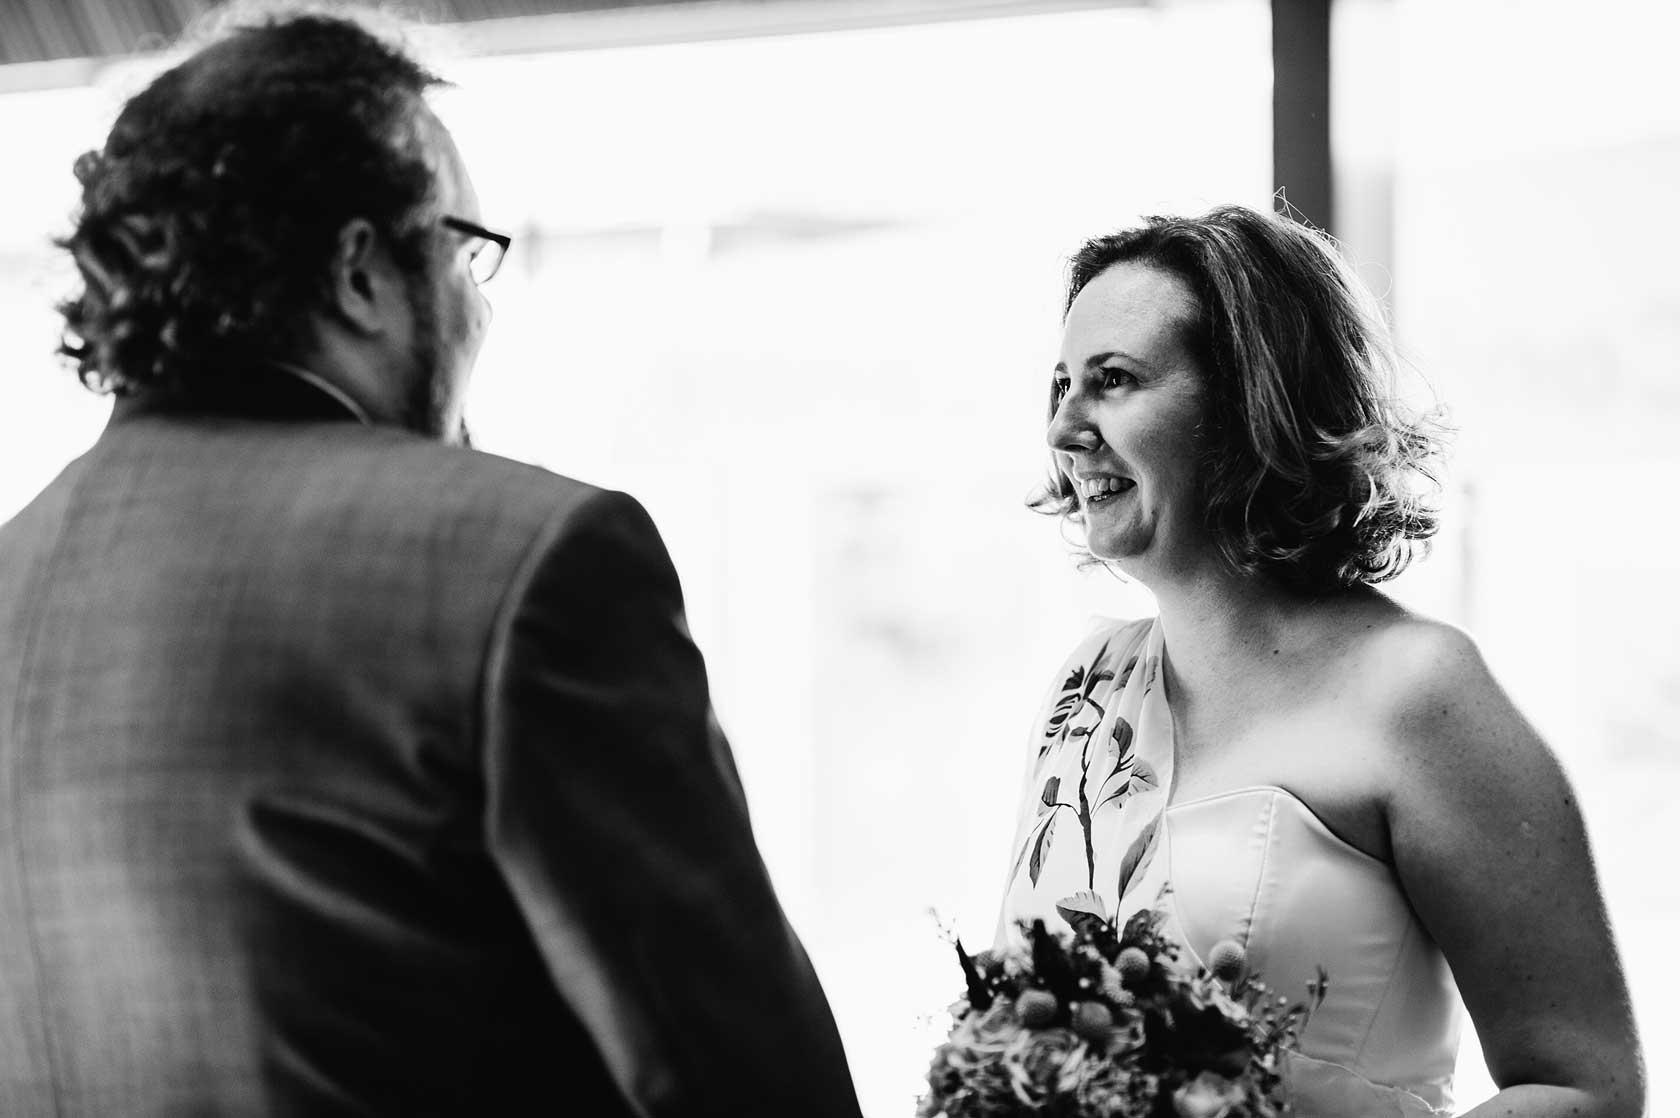 Reportage Wedding Photography at Brockholes